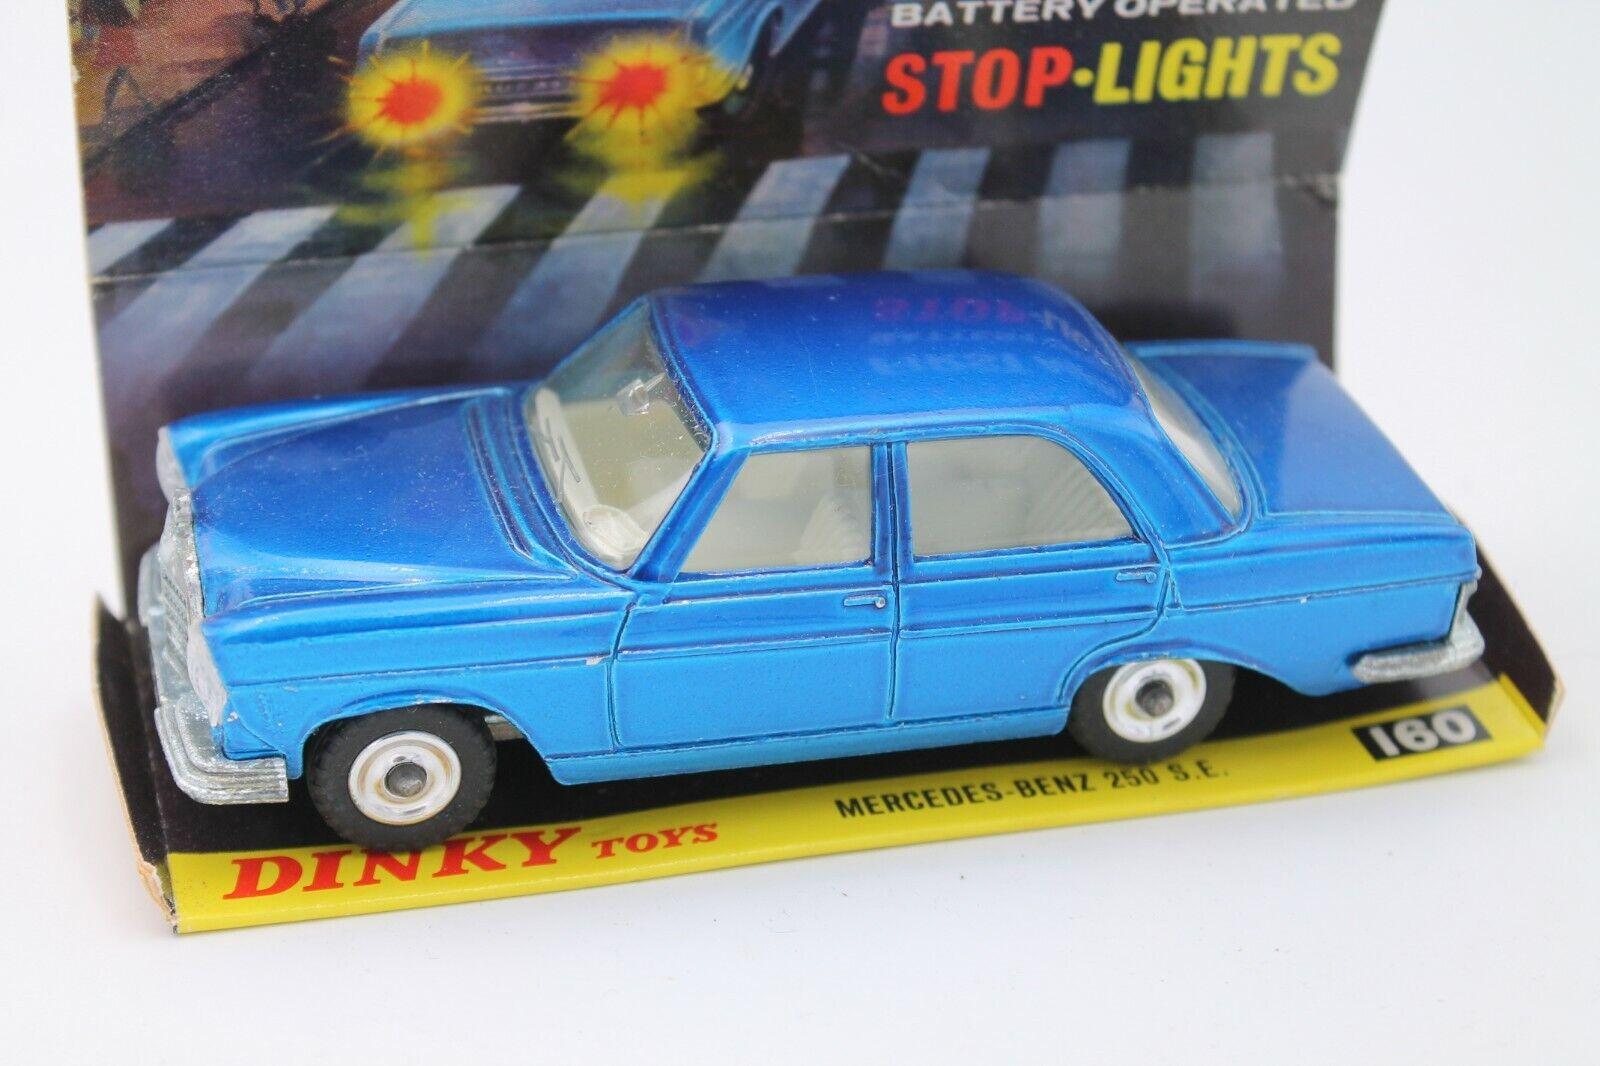 DINKY TOYS  MERCEDES BENZ 250 SE  Stop Lights  1 36  Comme neuf  Neuf dans sa boîte